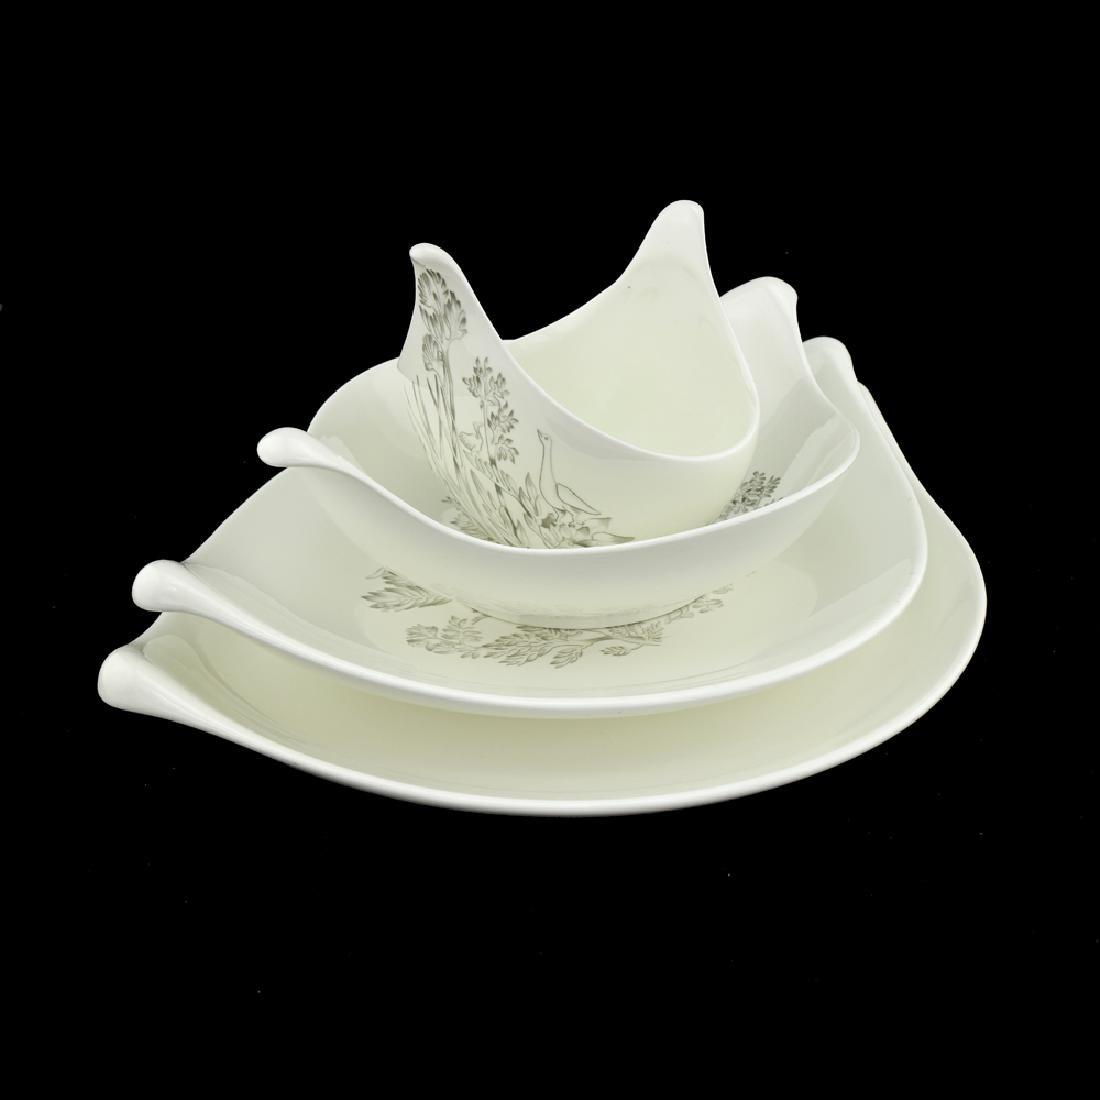 Zeisel Hallcraft Century Nesting Serving Bowls - 2